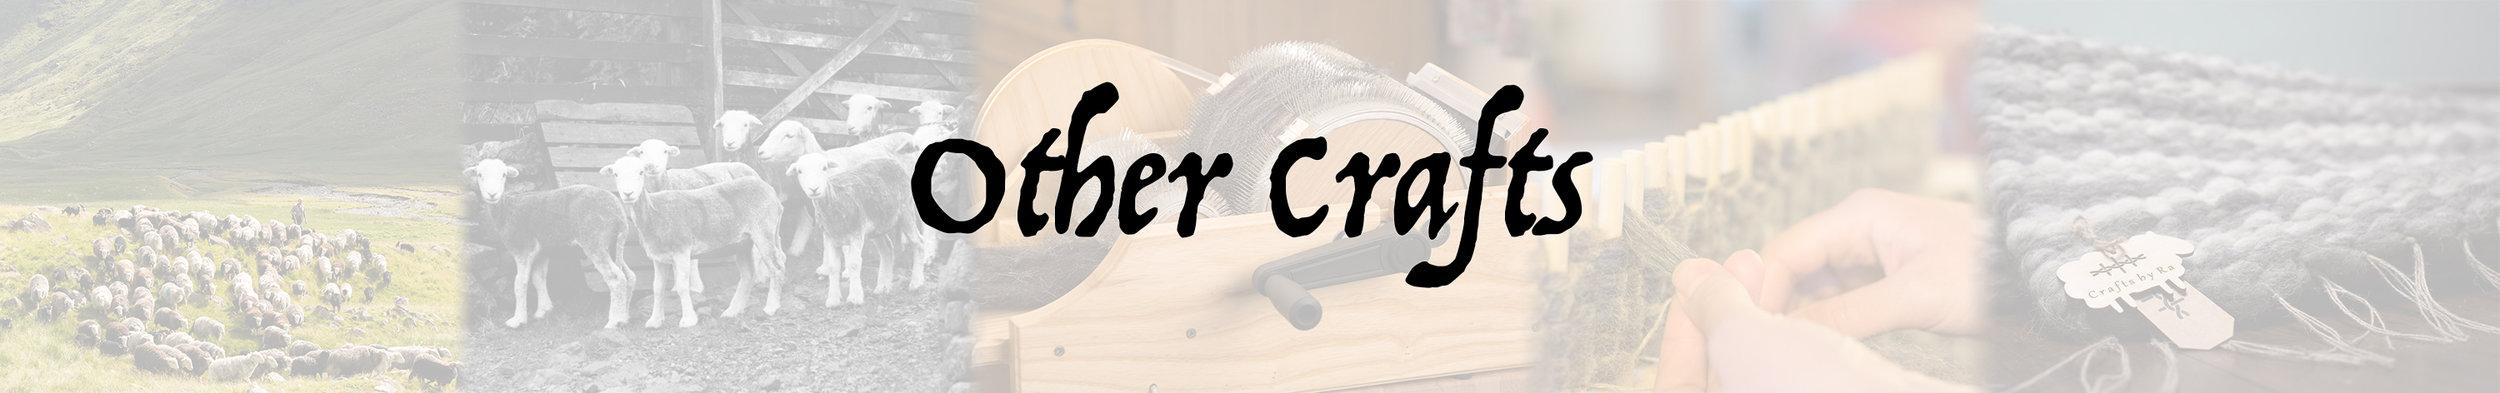 Other Crafts.jpg